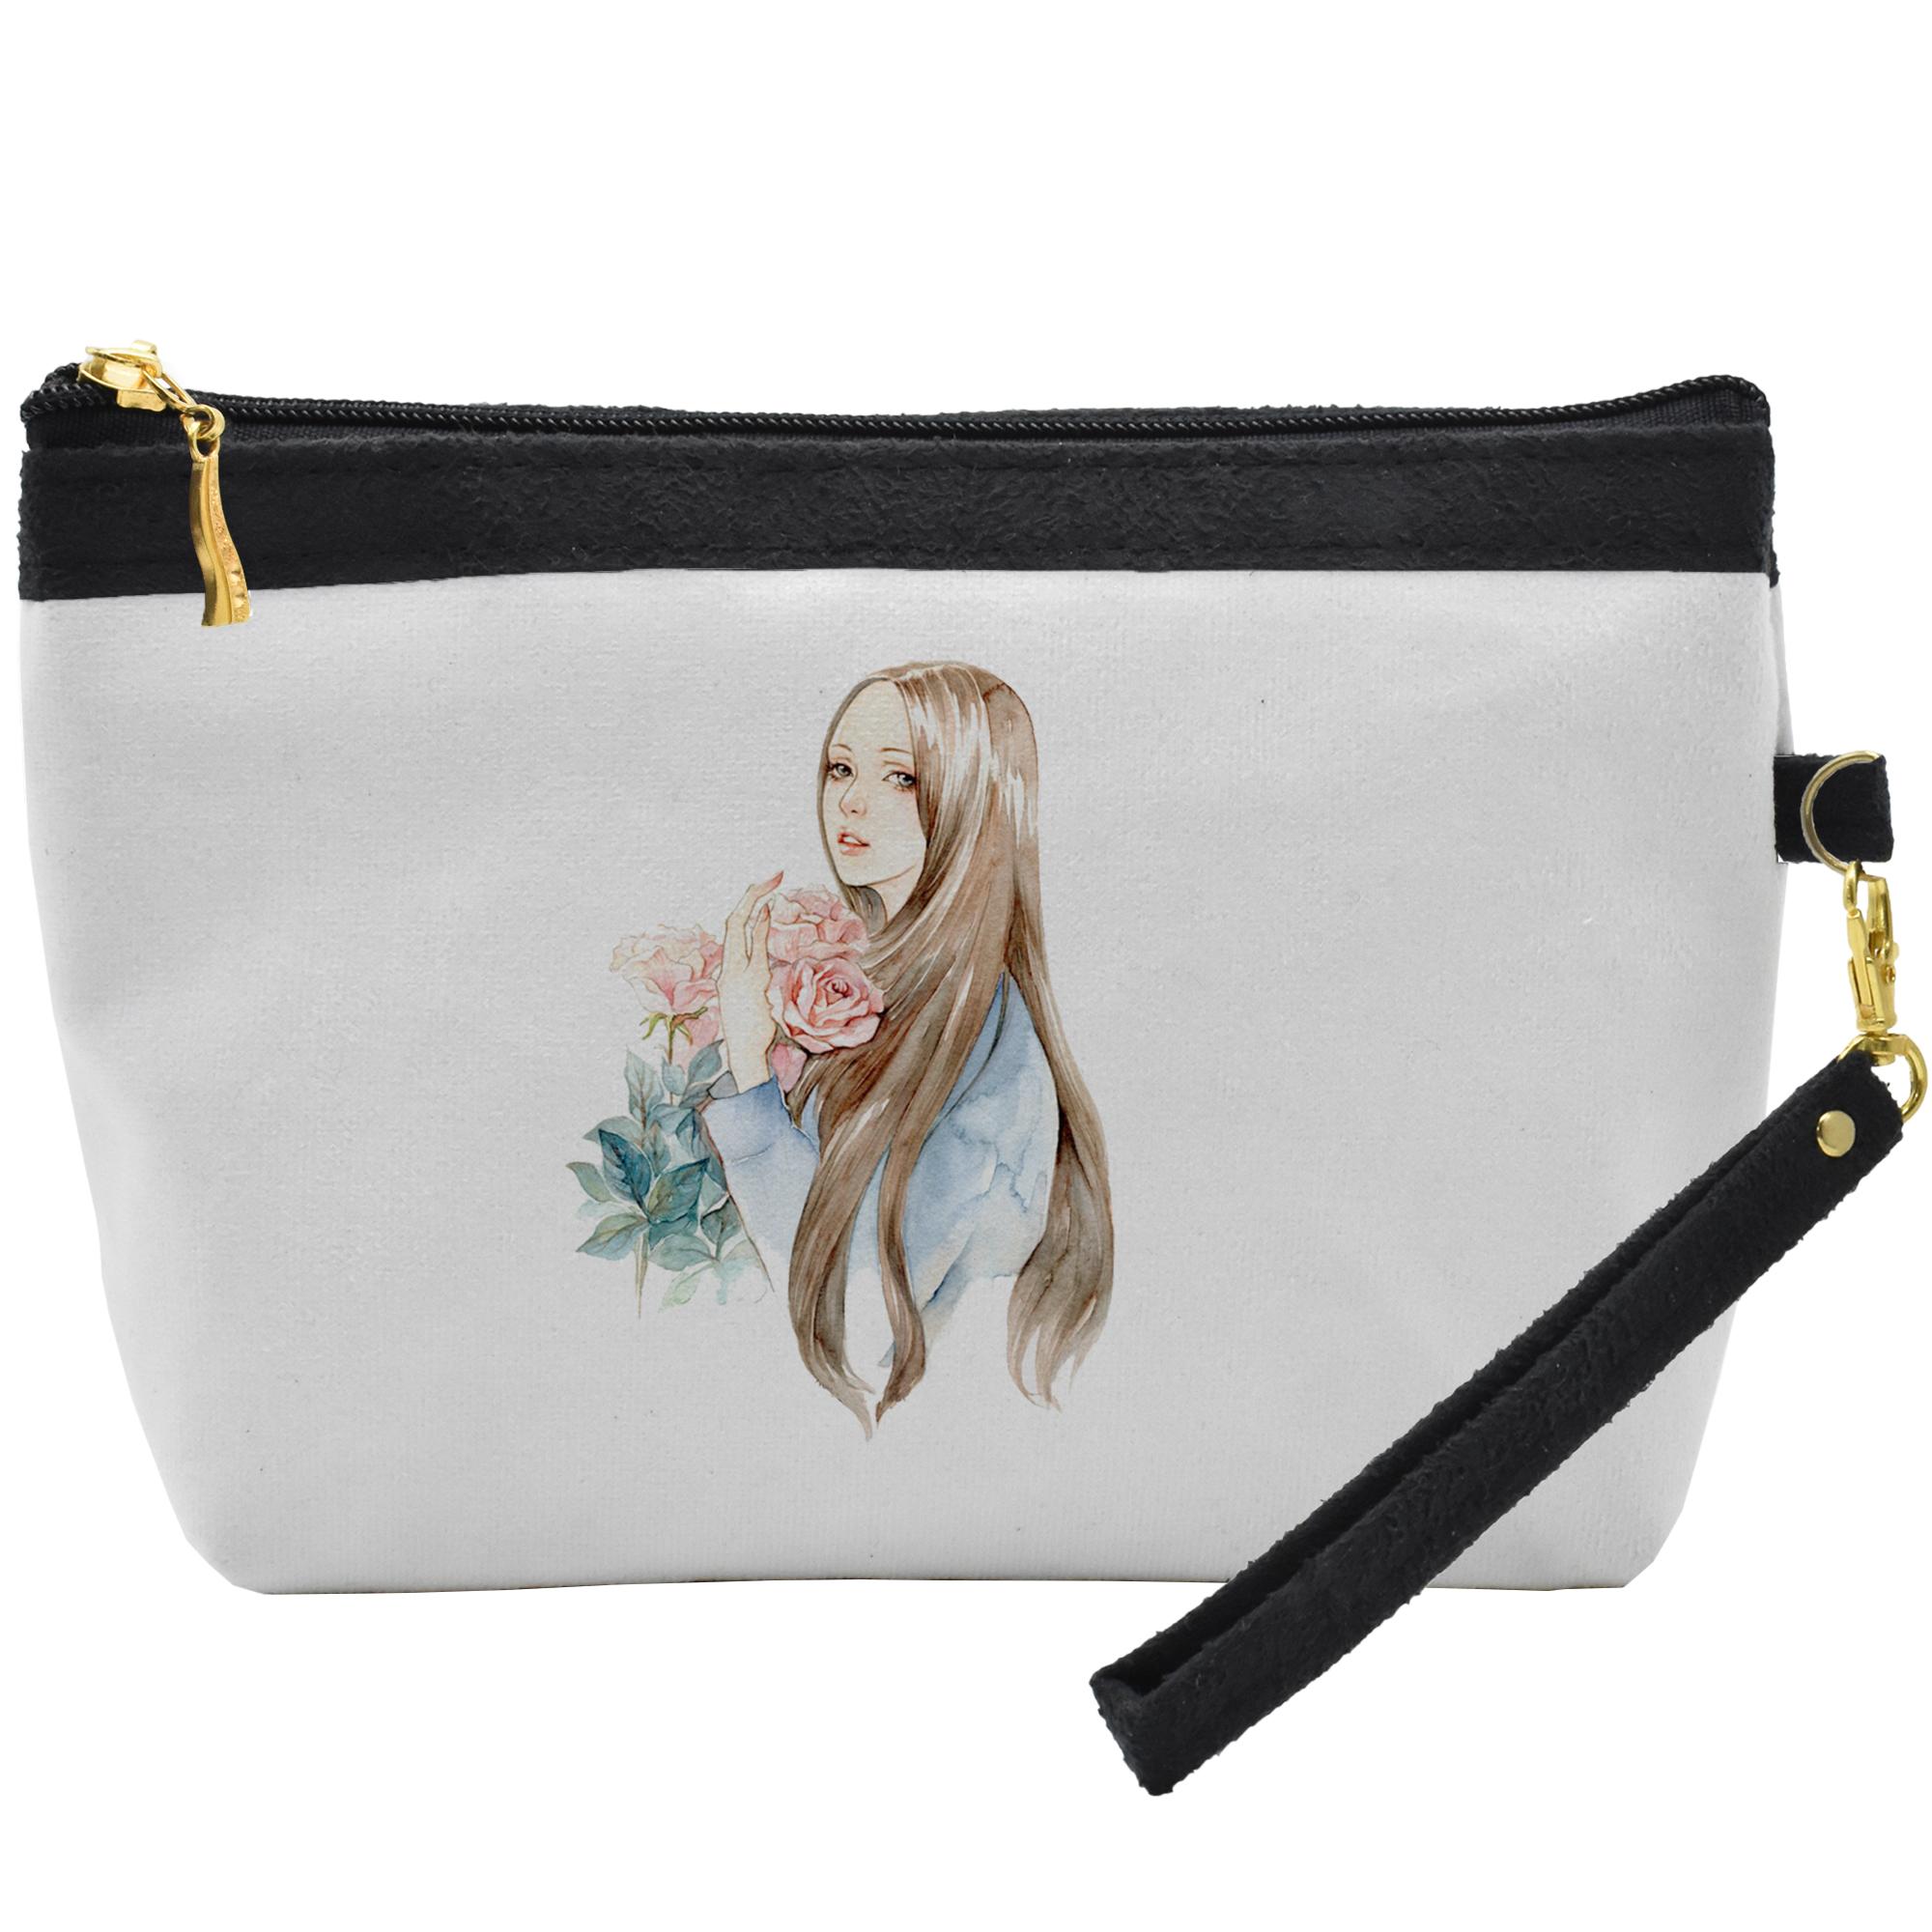 کیف لوازم آرایشی طرح دختر مو طلایی کد C08